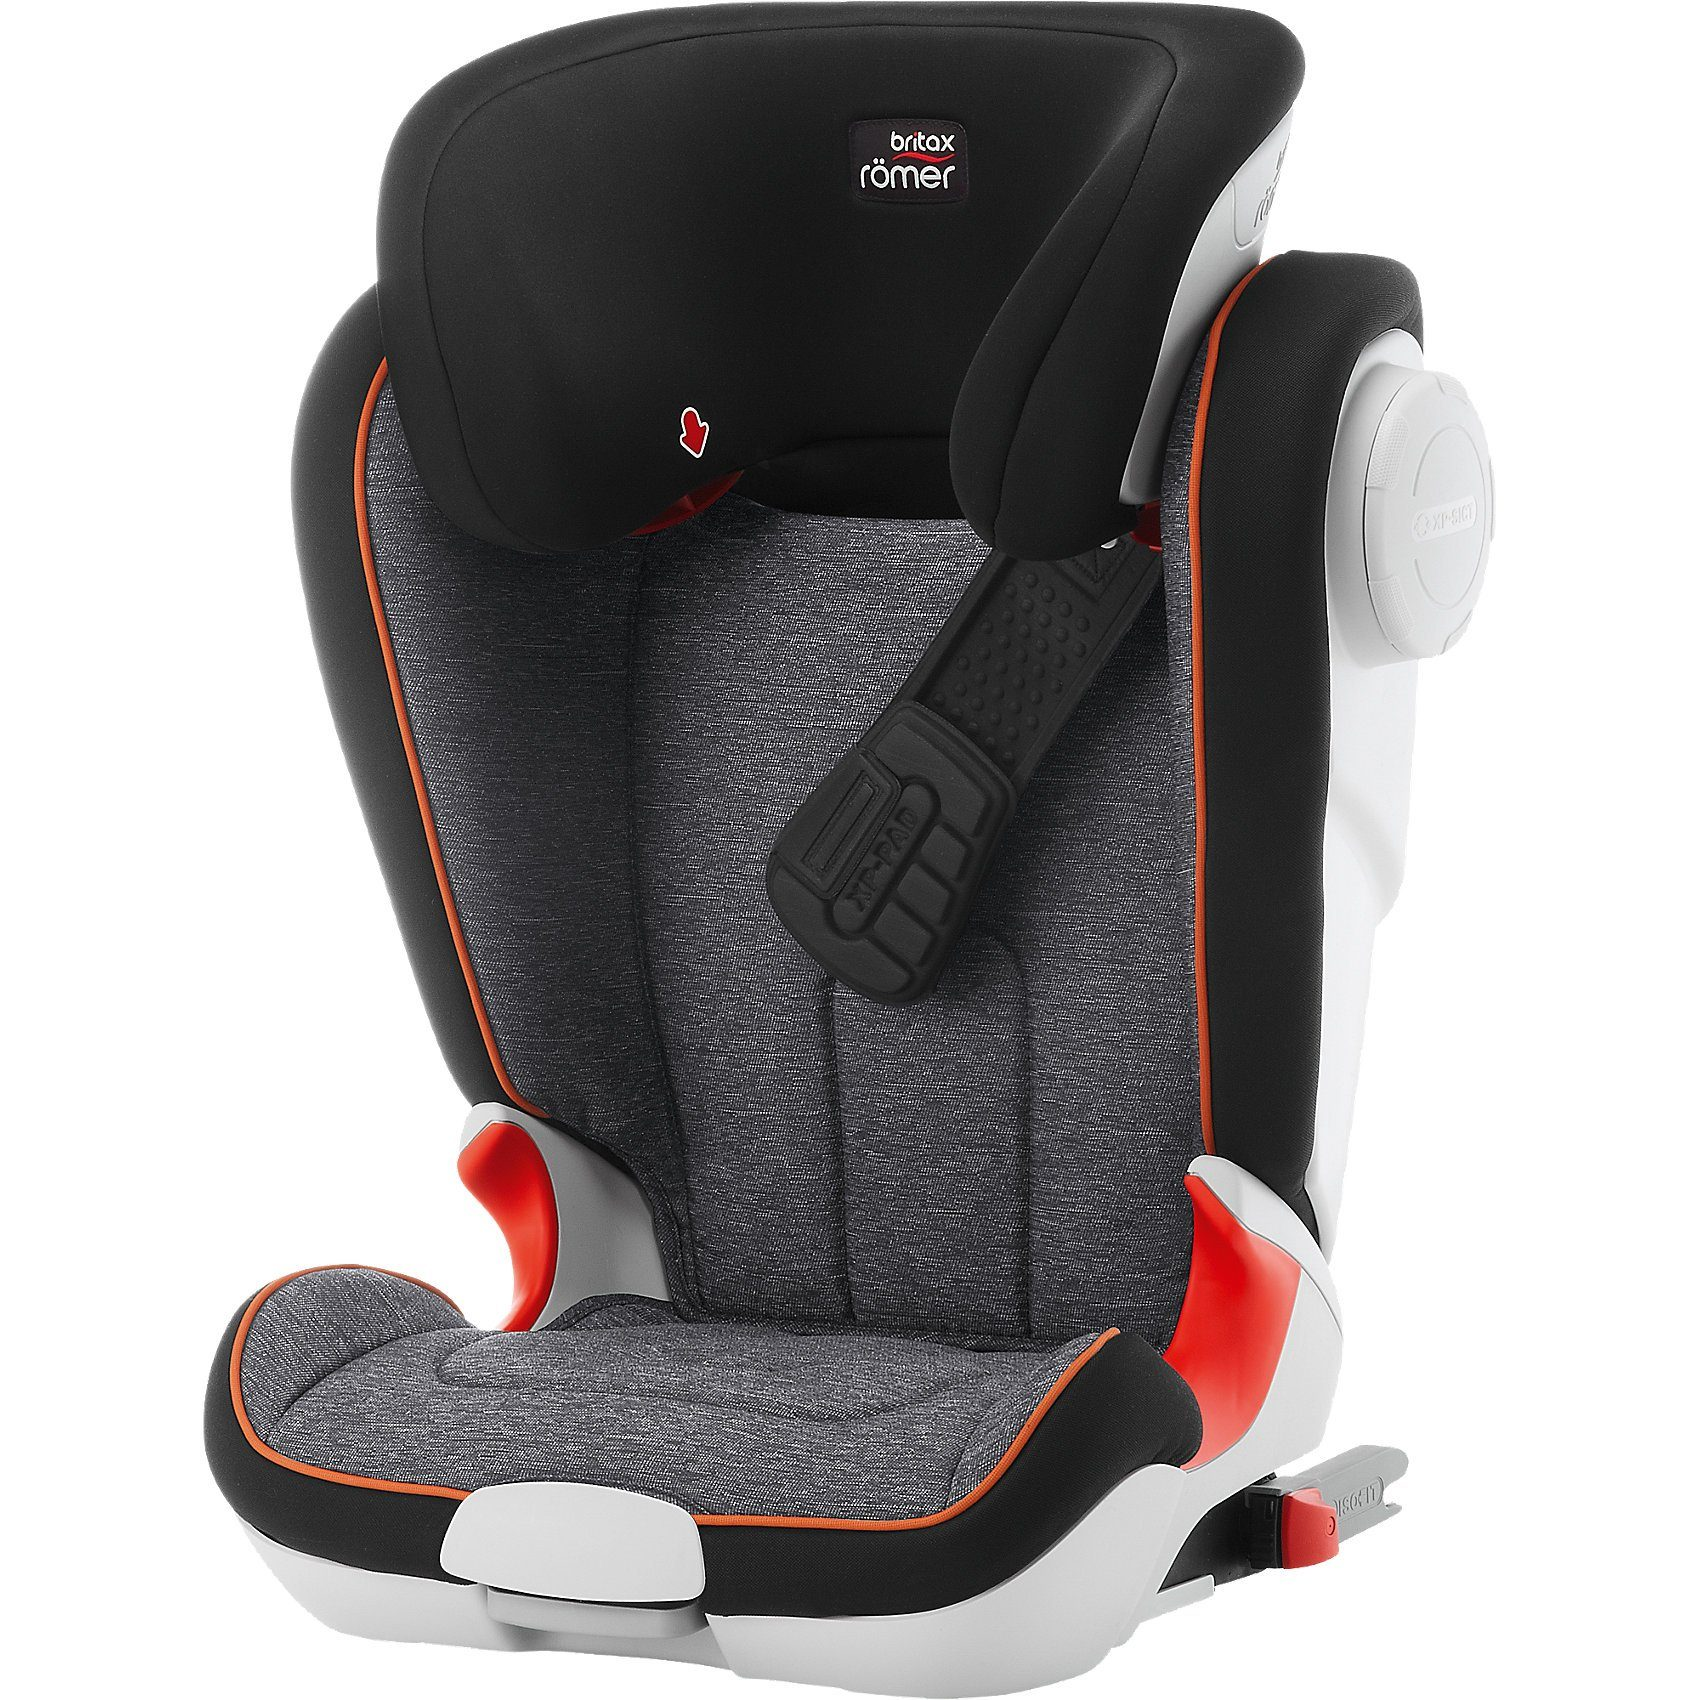 Britax Römer Auto-Kindersitz Kidfix XP Sict, Black Marble, 2016